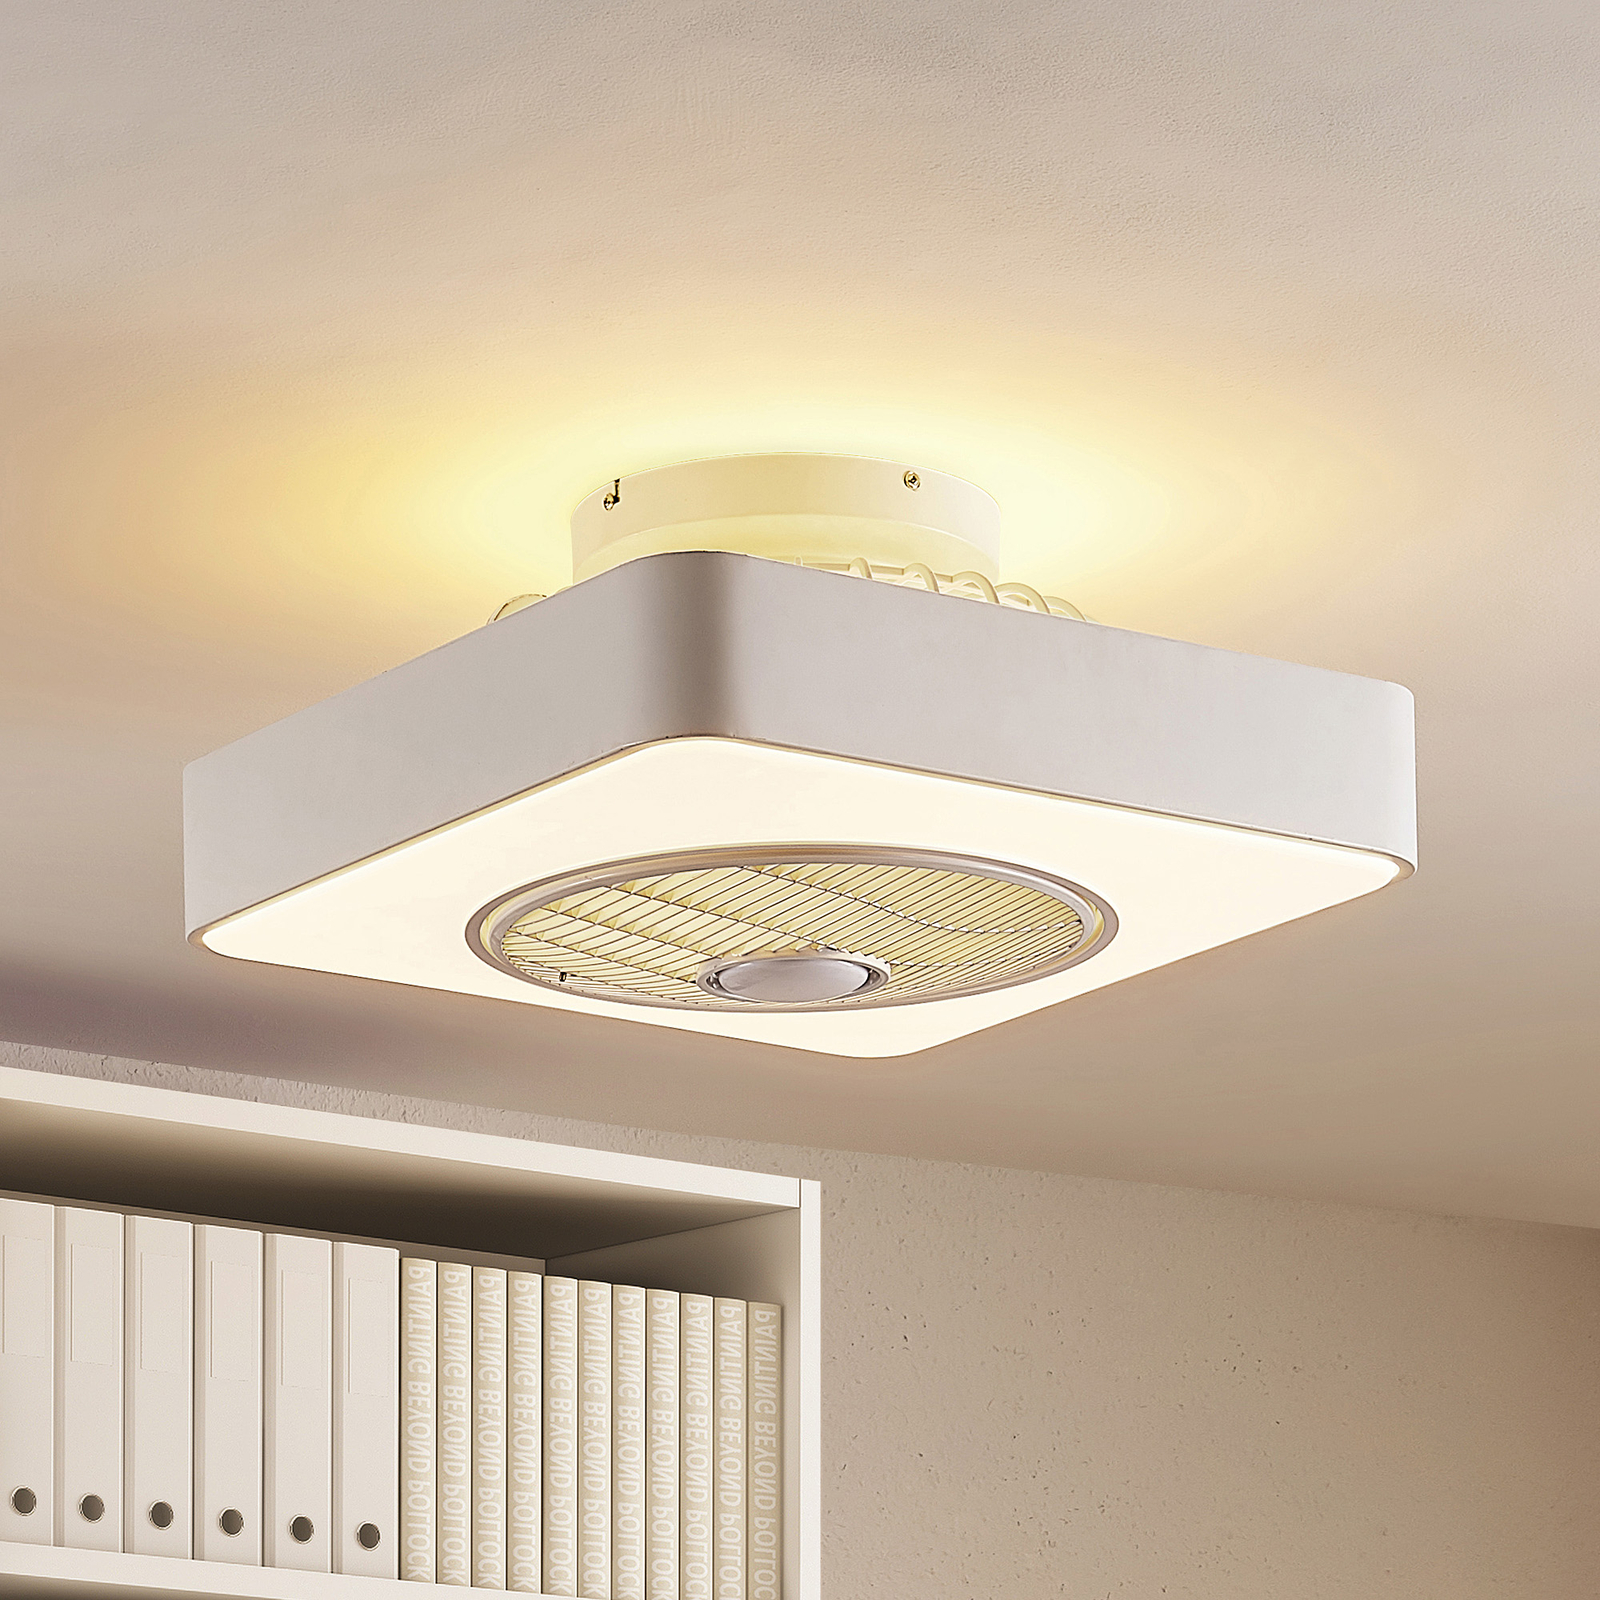 Lindby Danischa ventilatore da soffitto LED